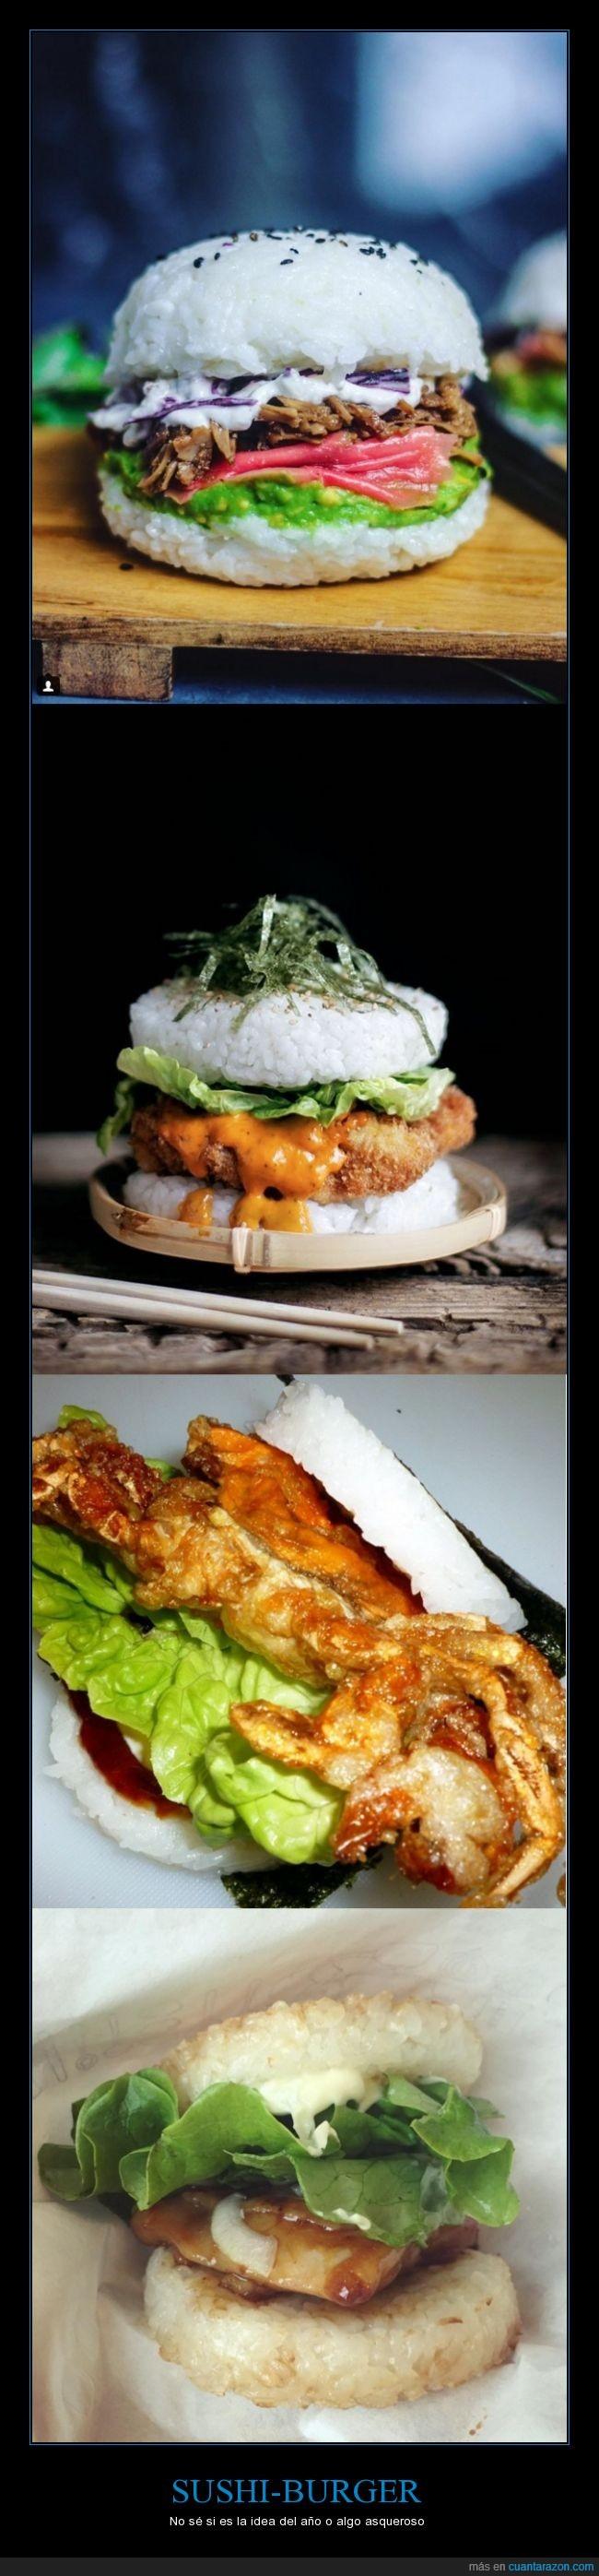 arroz,burguer,hamburguesa,sushi